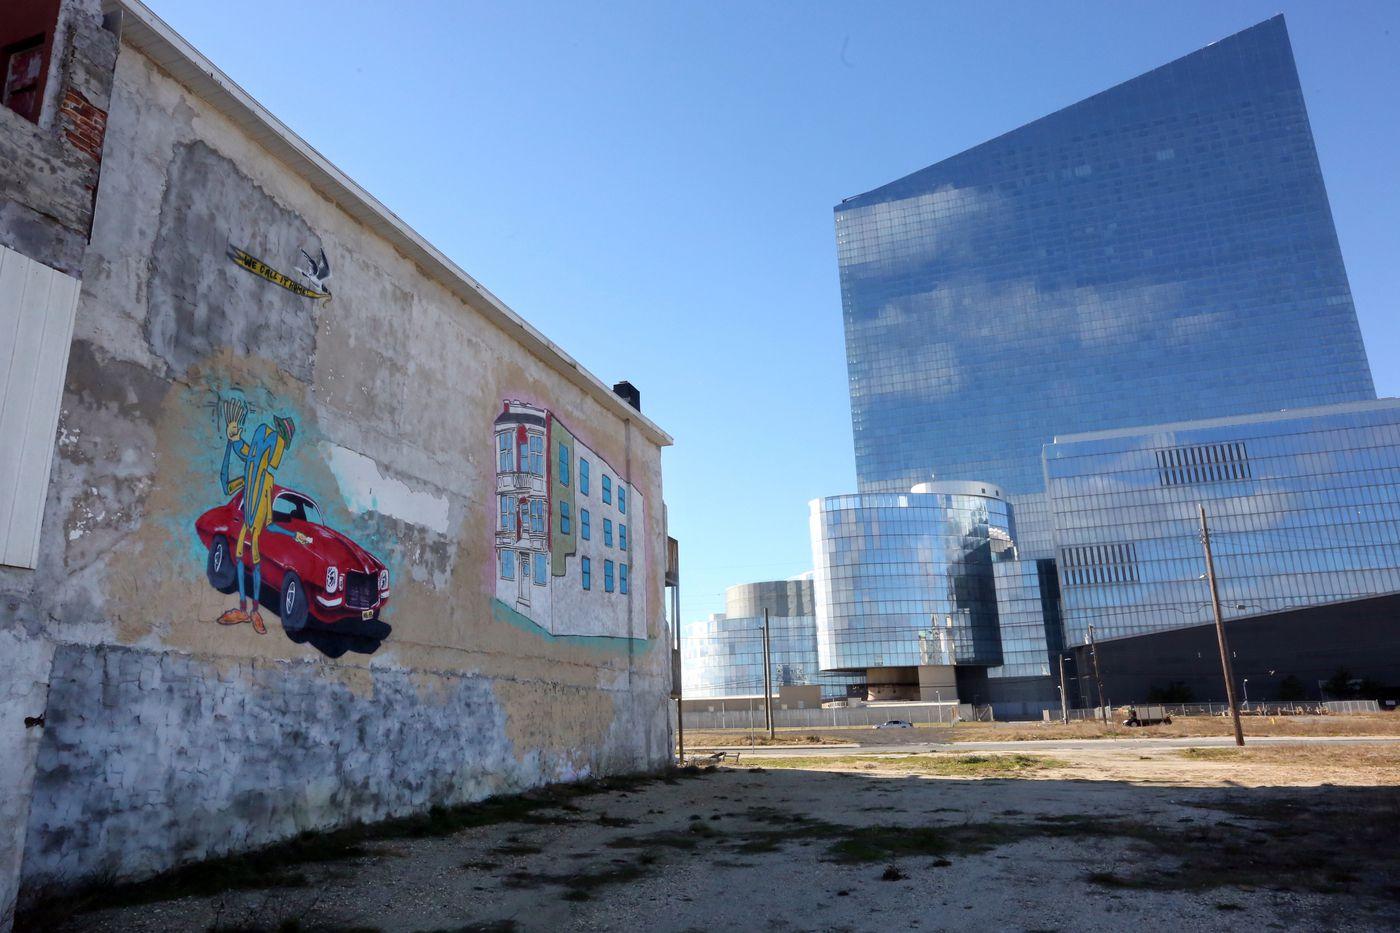 atlantic city casino mural art